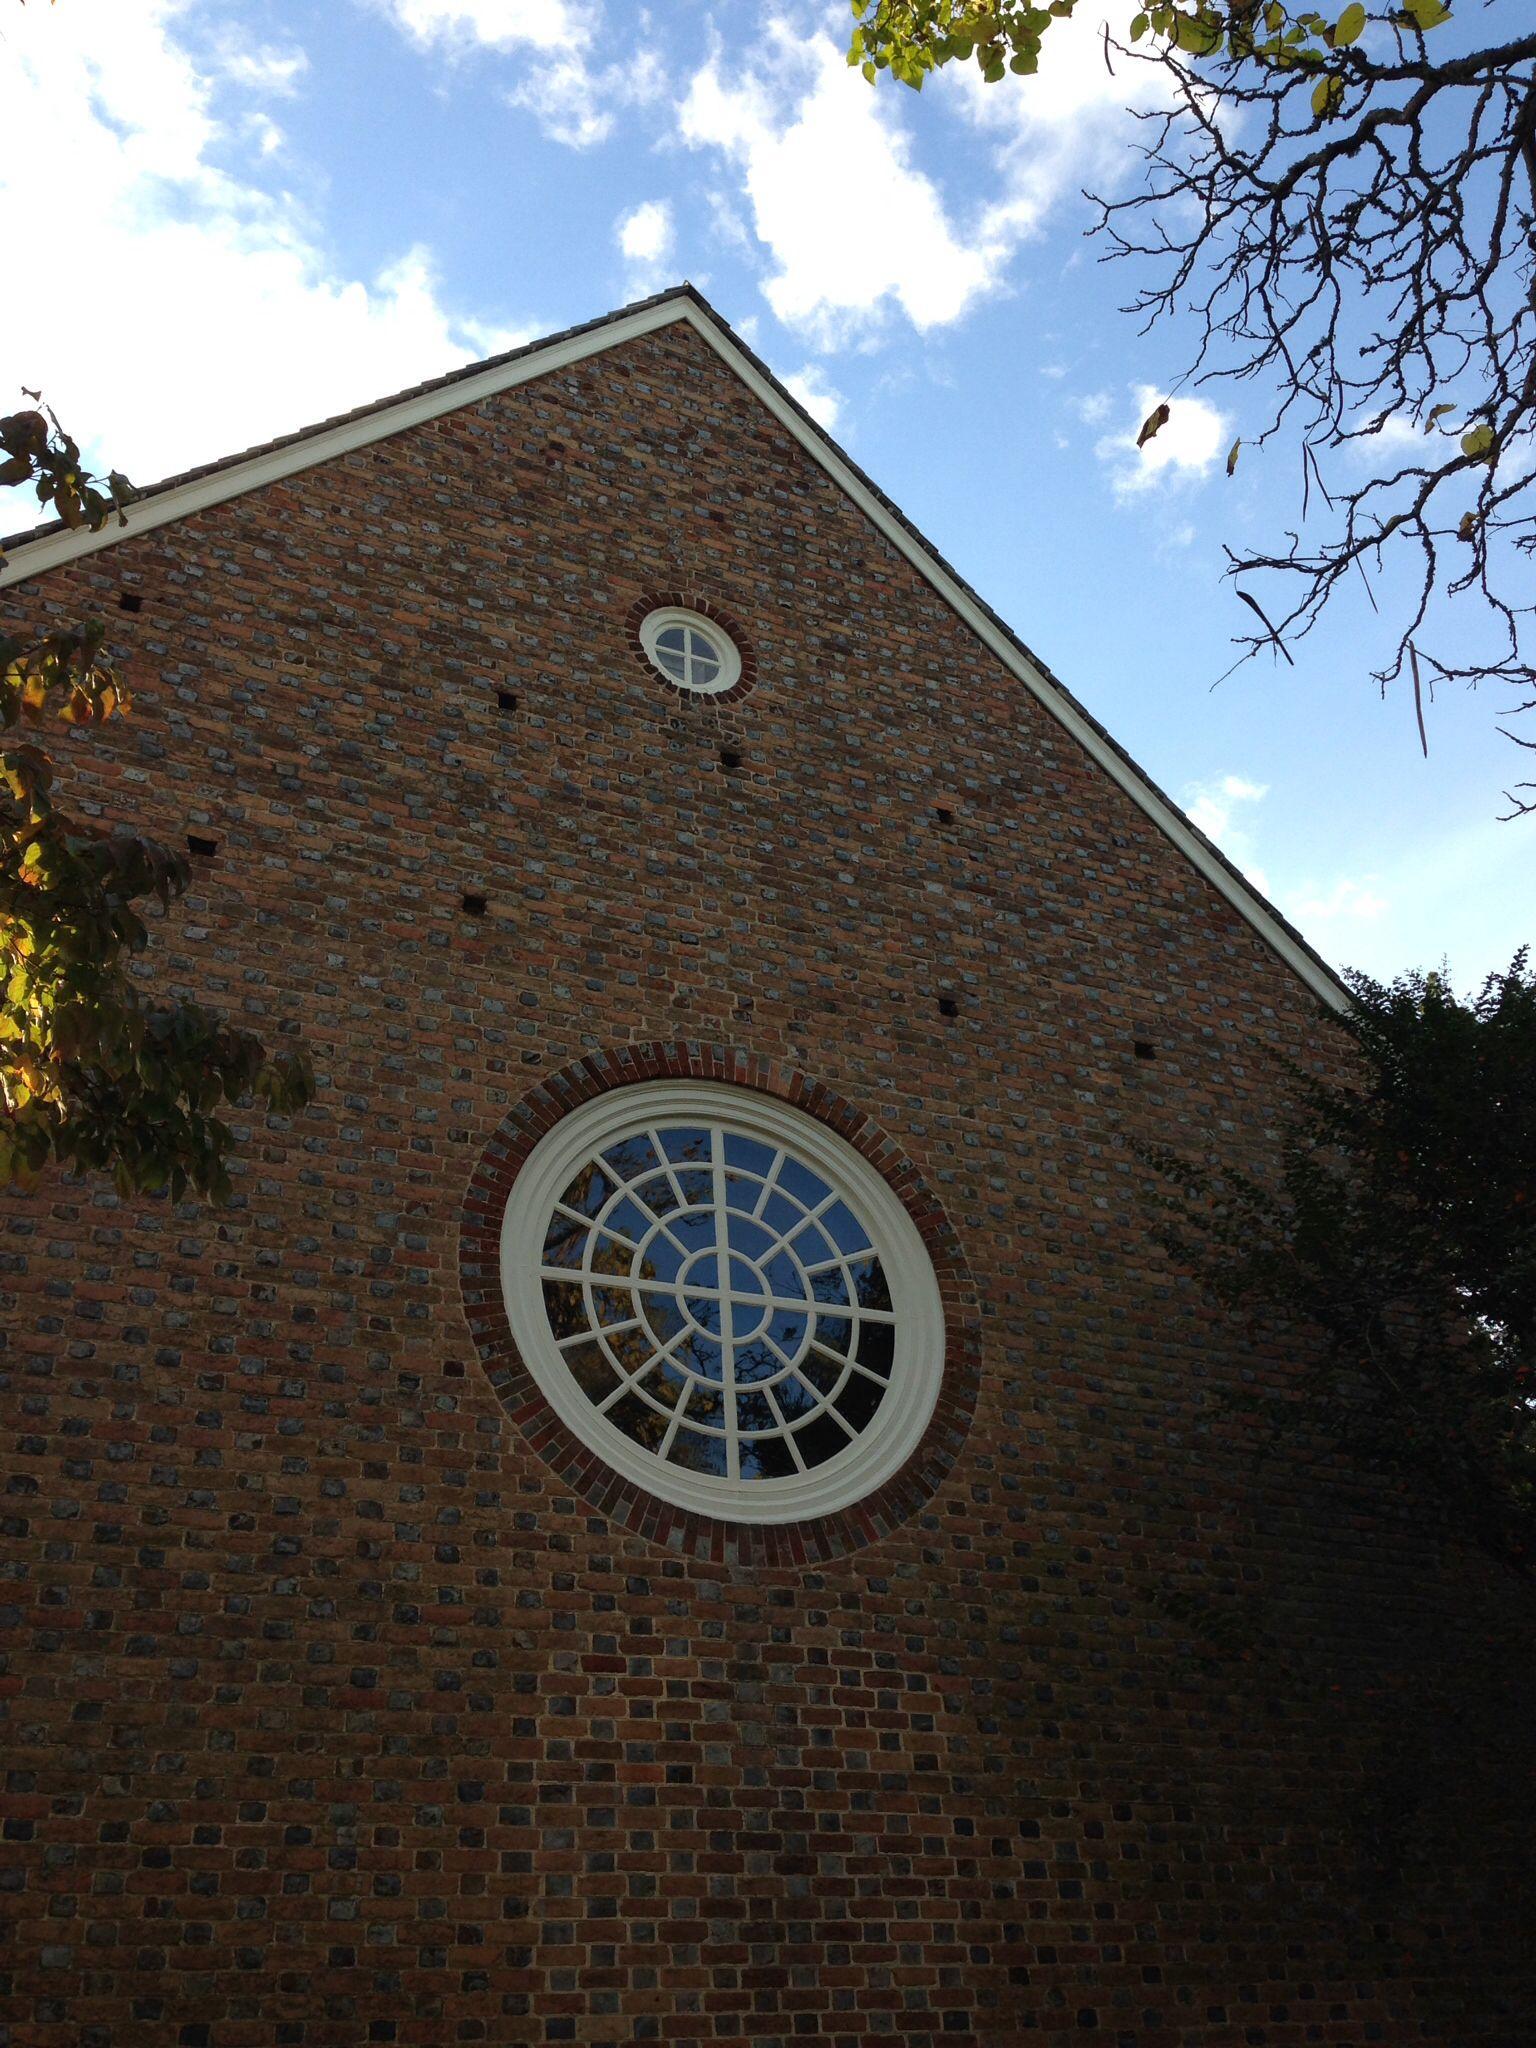 Round window on side of Bruton Parish Church in Colonial Williamsburg, Virginia © Elizabeth Higgins